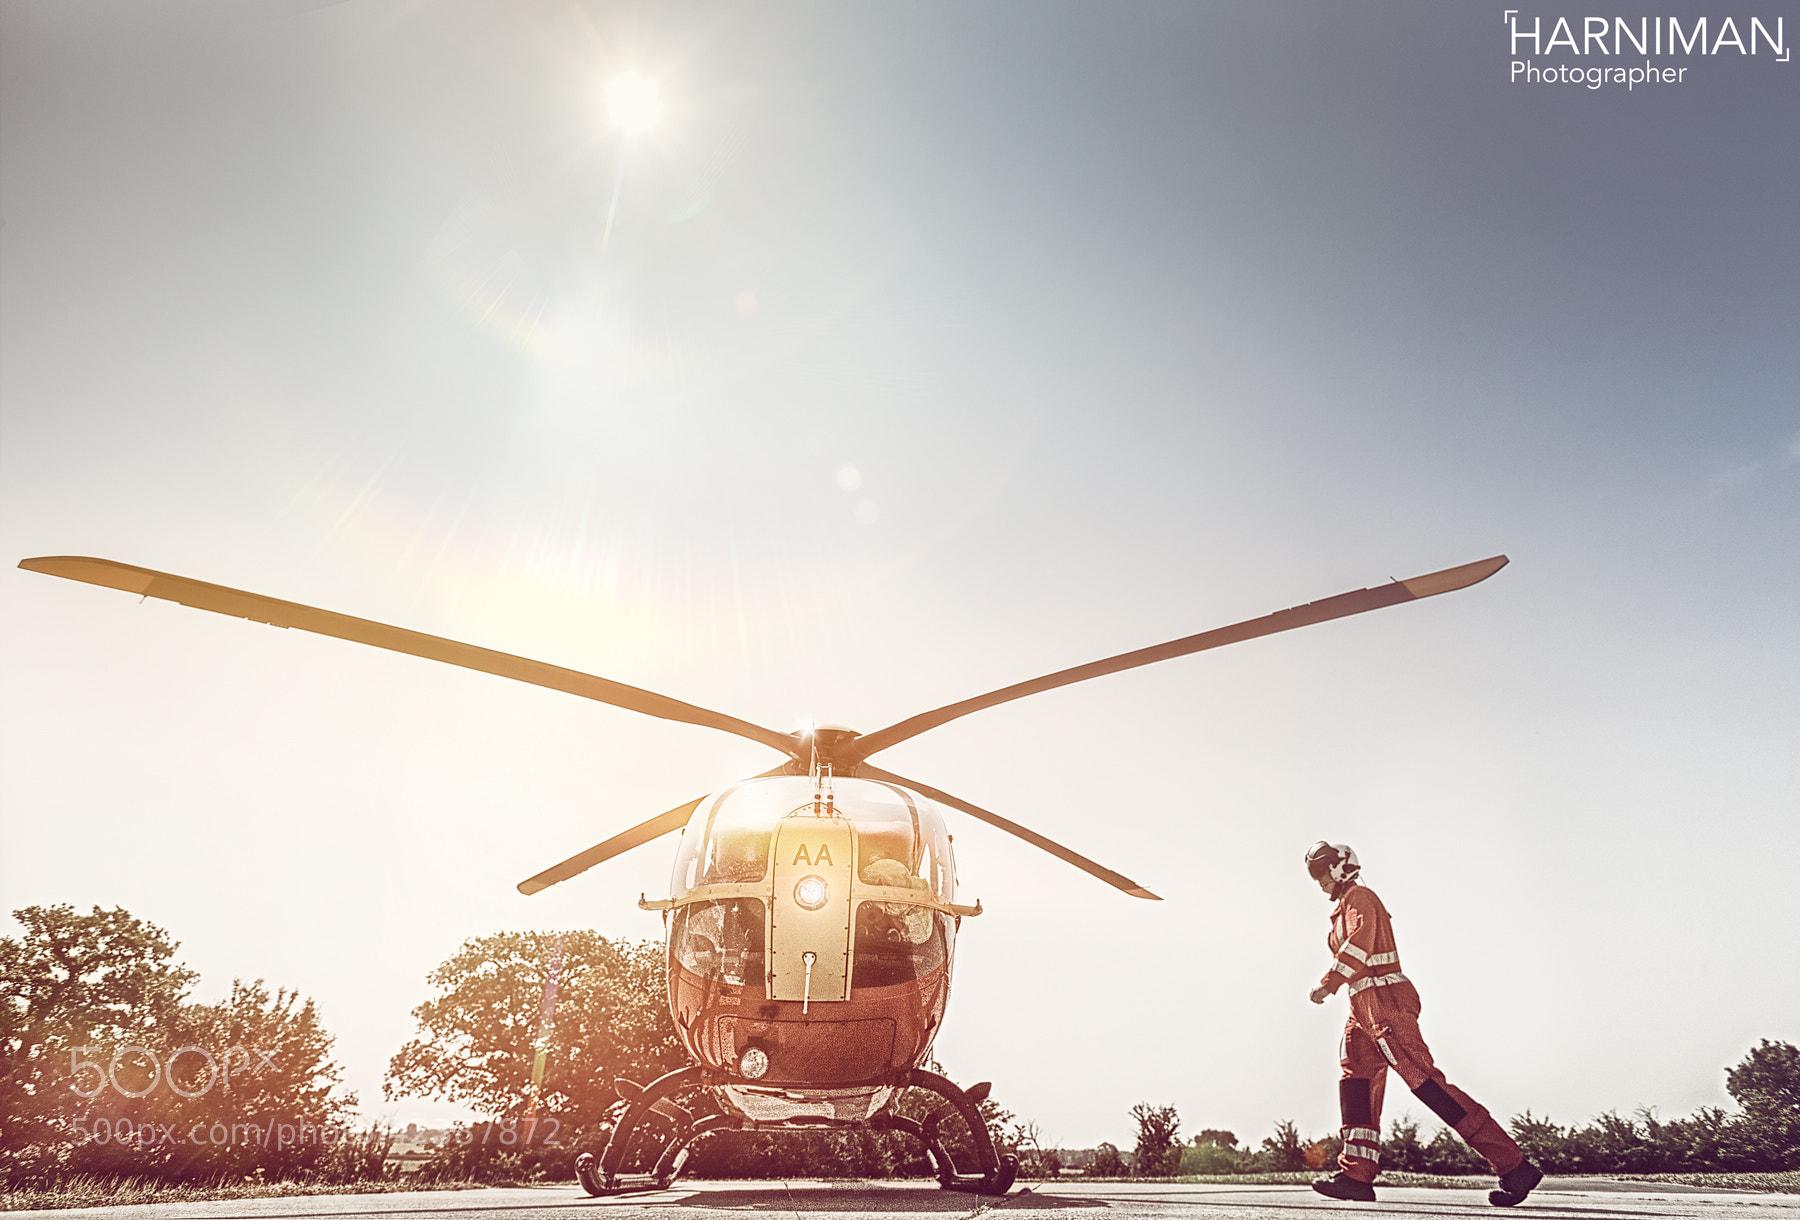 Photograph Air Ambulance by Nigel Harniman on 500px